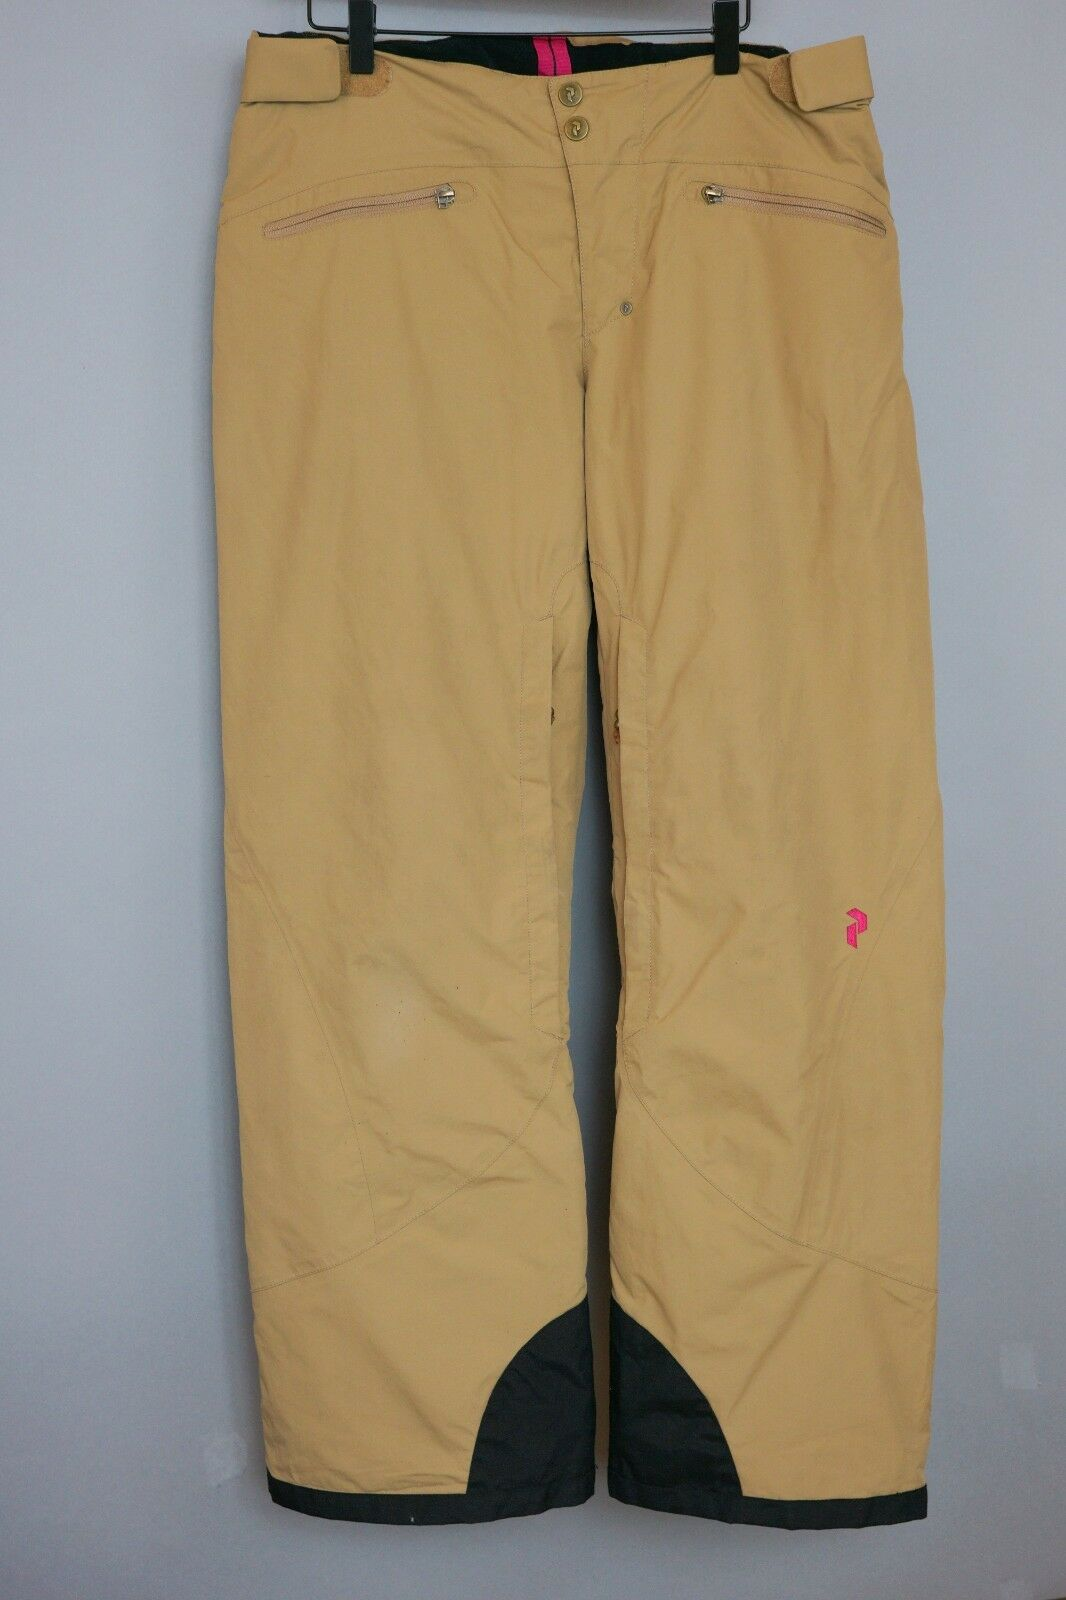 Women Peak Performance Skiing  Snowboarding Waterproof Trousers L W36 L30  sale with high discount